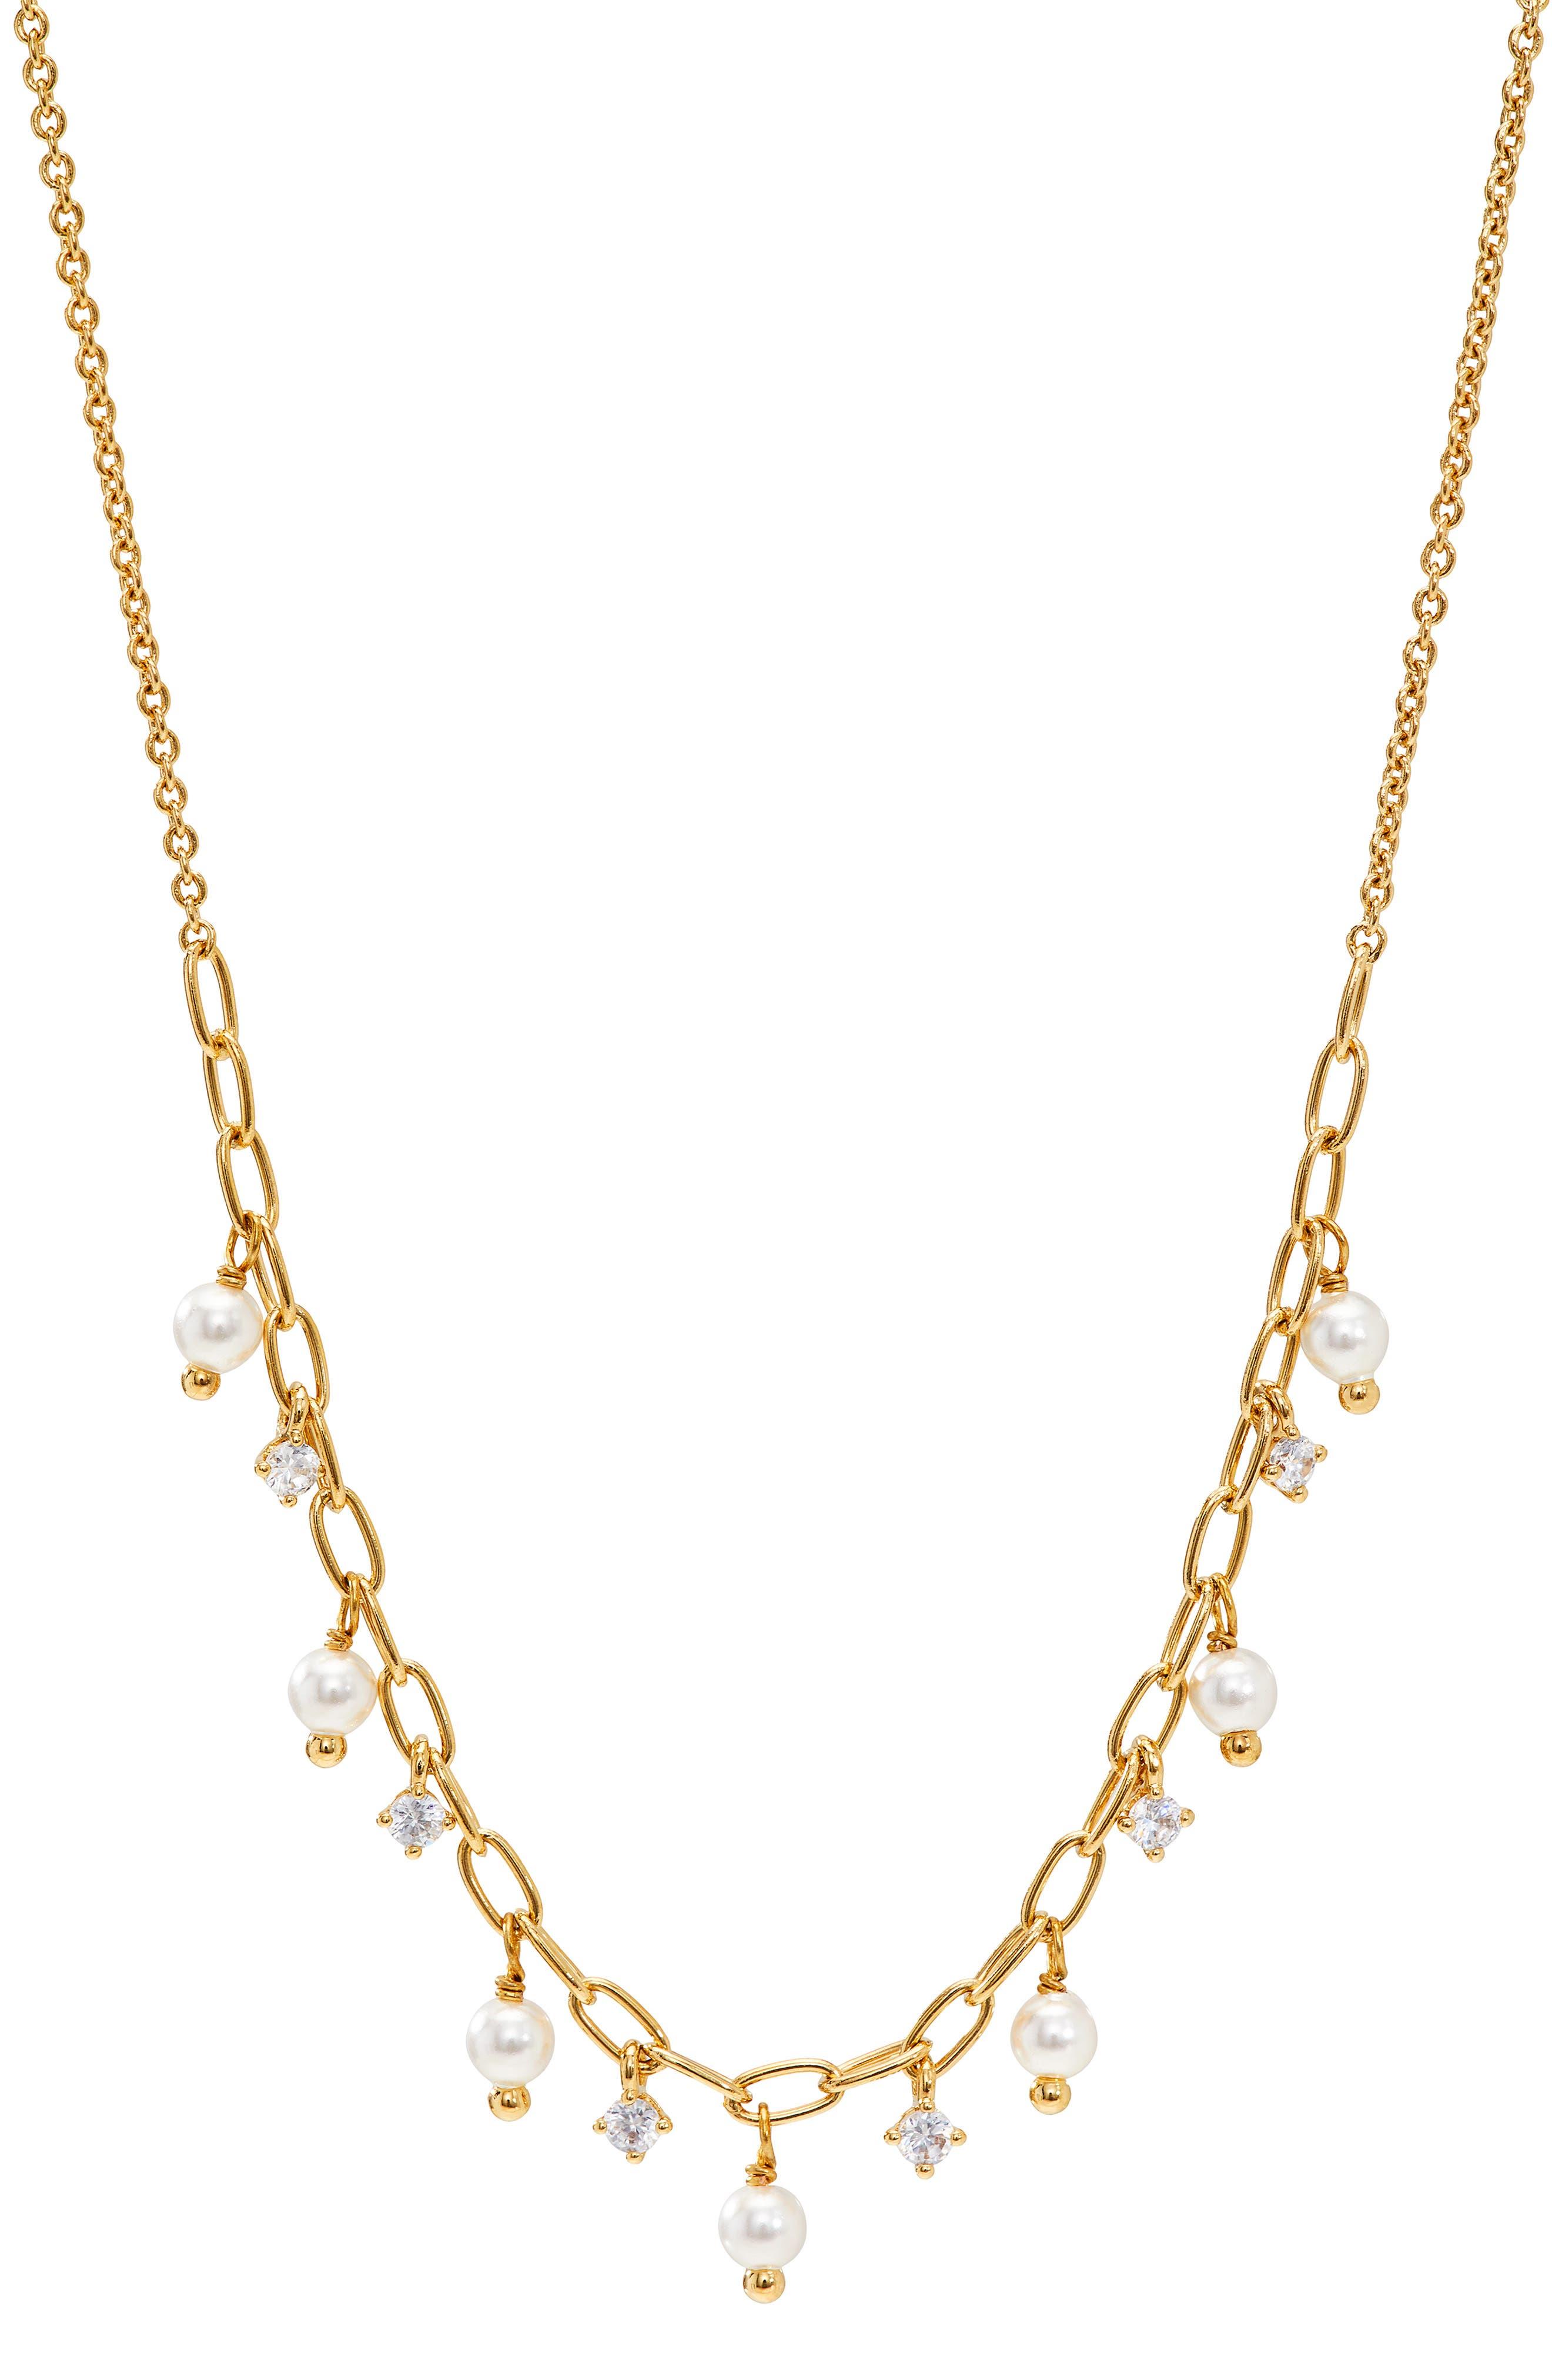 Shaky Cubic Zirconia & Imitation Pearl Necklace